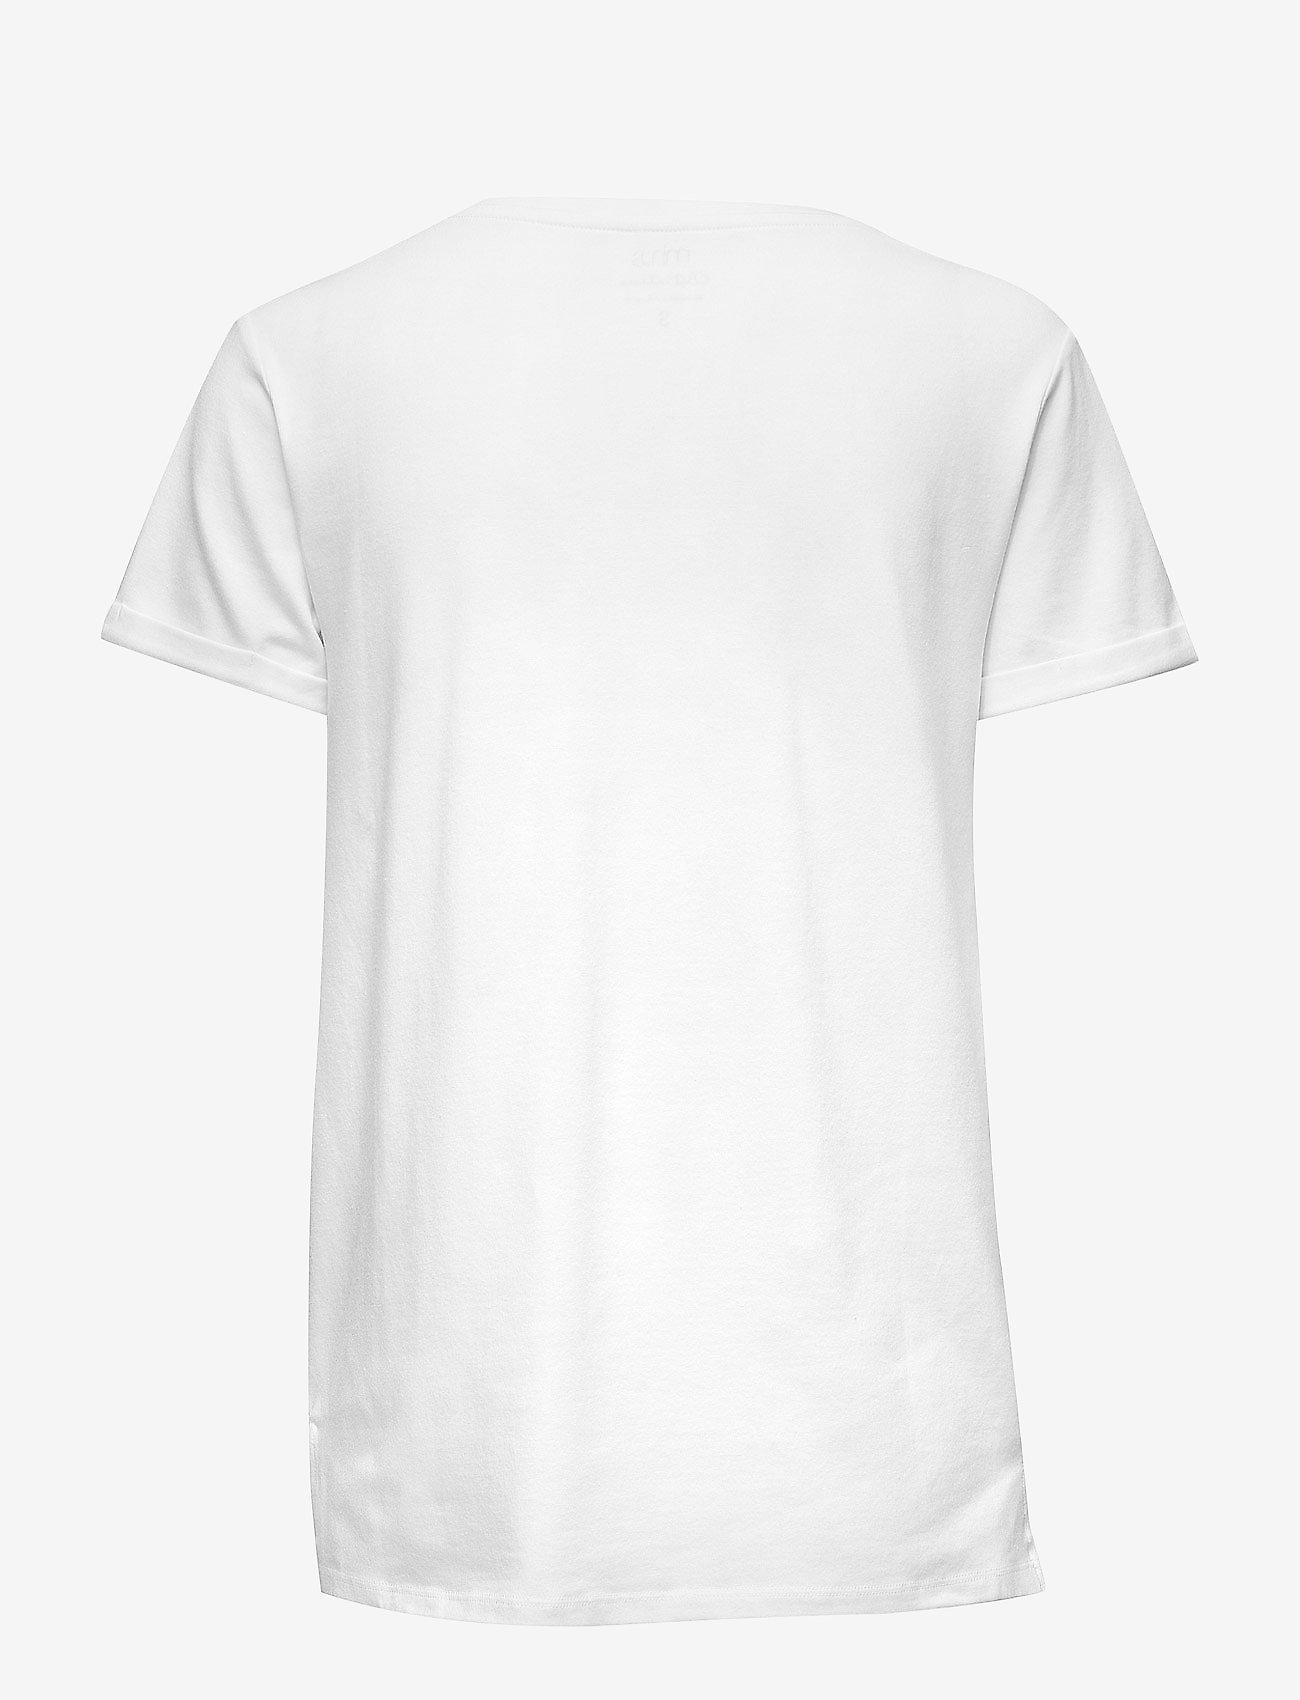 Minus - Adele tee - t-shirts - white - 1